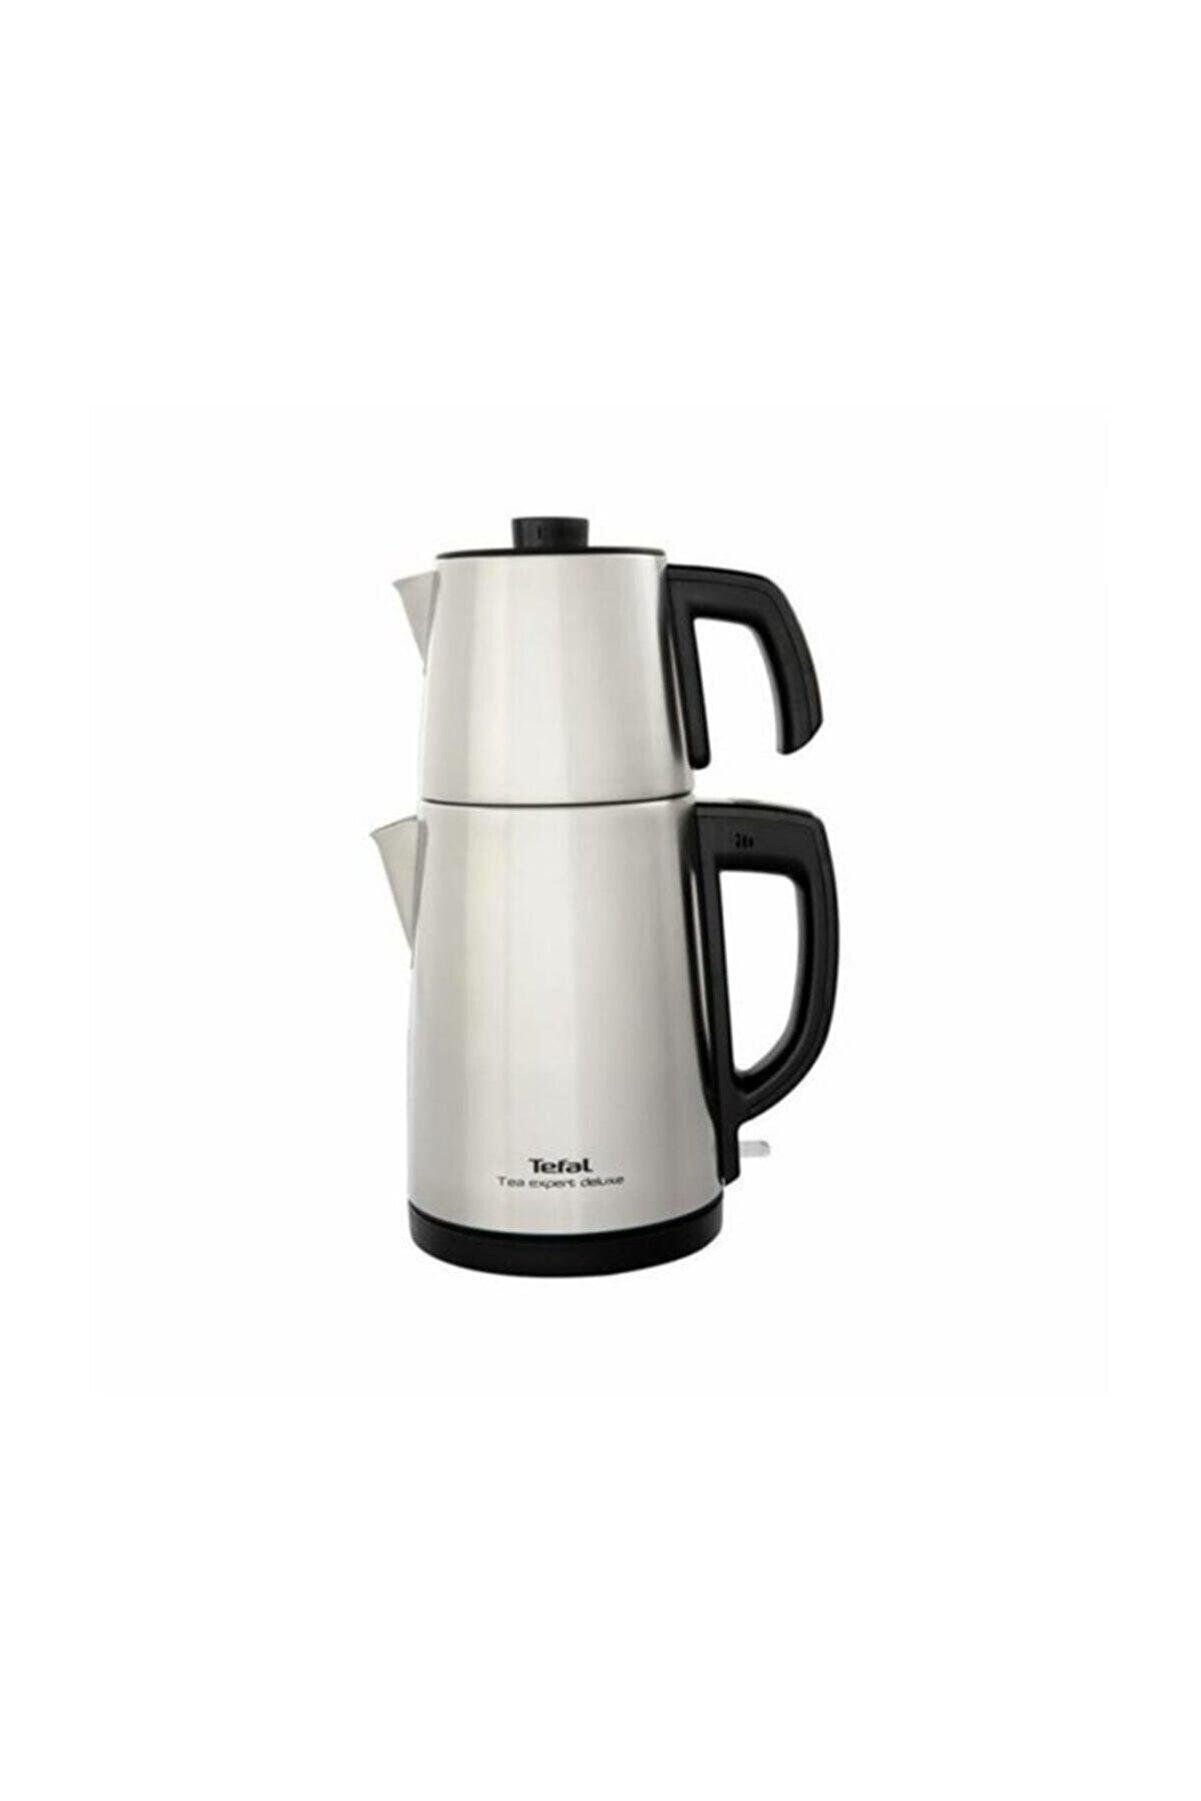 TEFAL Tea Expert Deluxe Inox Çelik Çay Makinesi, Xl Kapasite, Bj5098tr